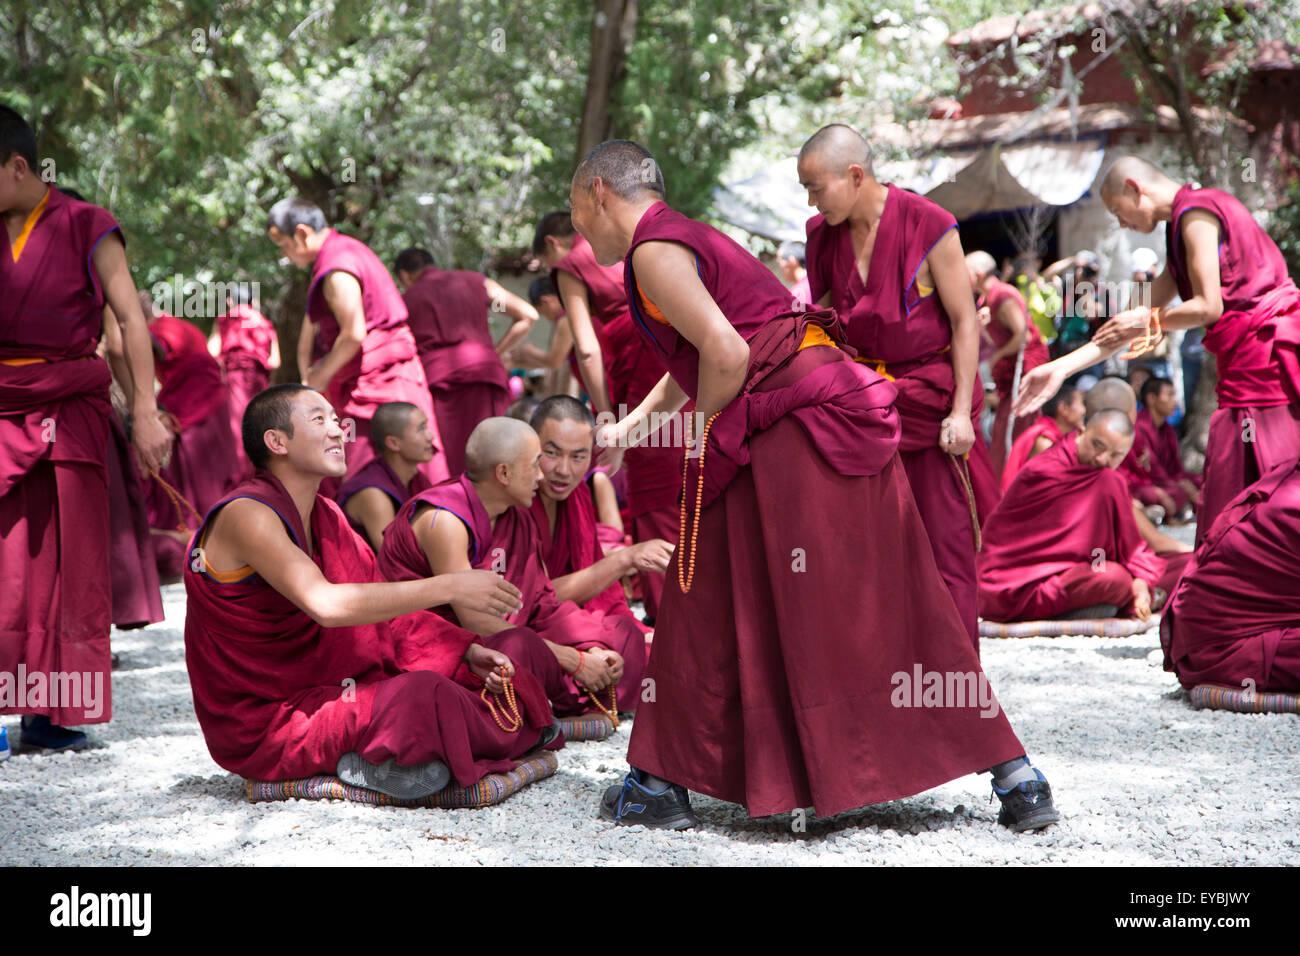 Monks debate in Lhasa, Tibet - Stock Image